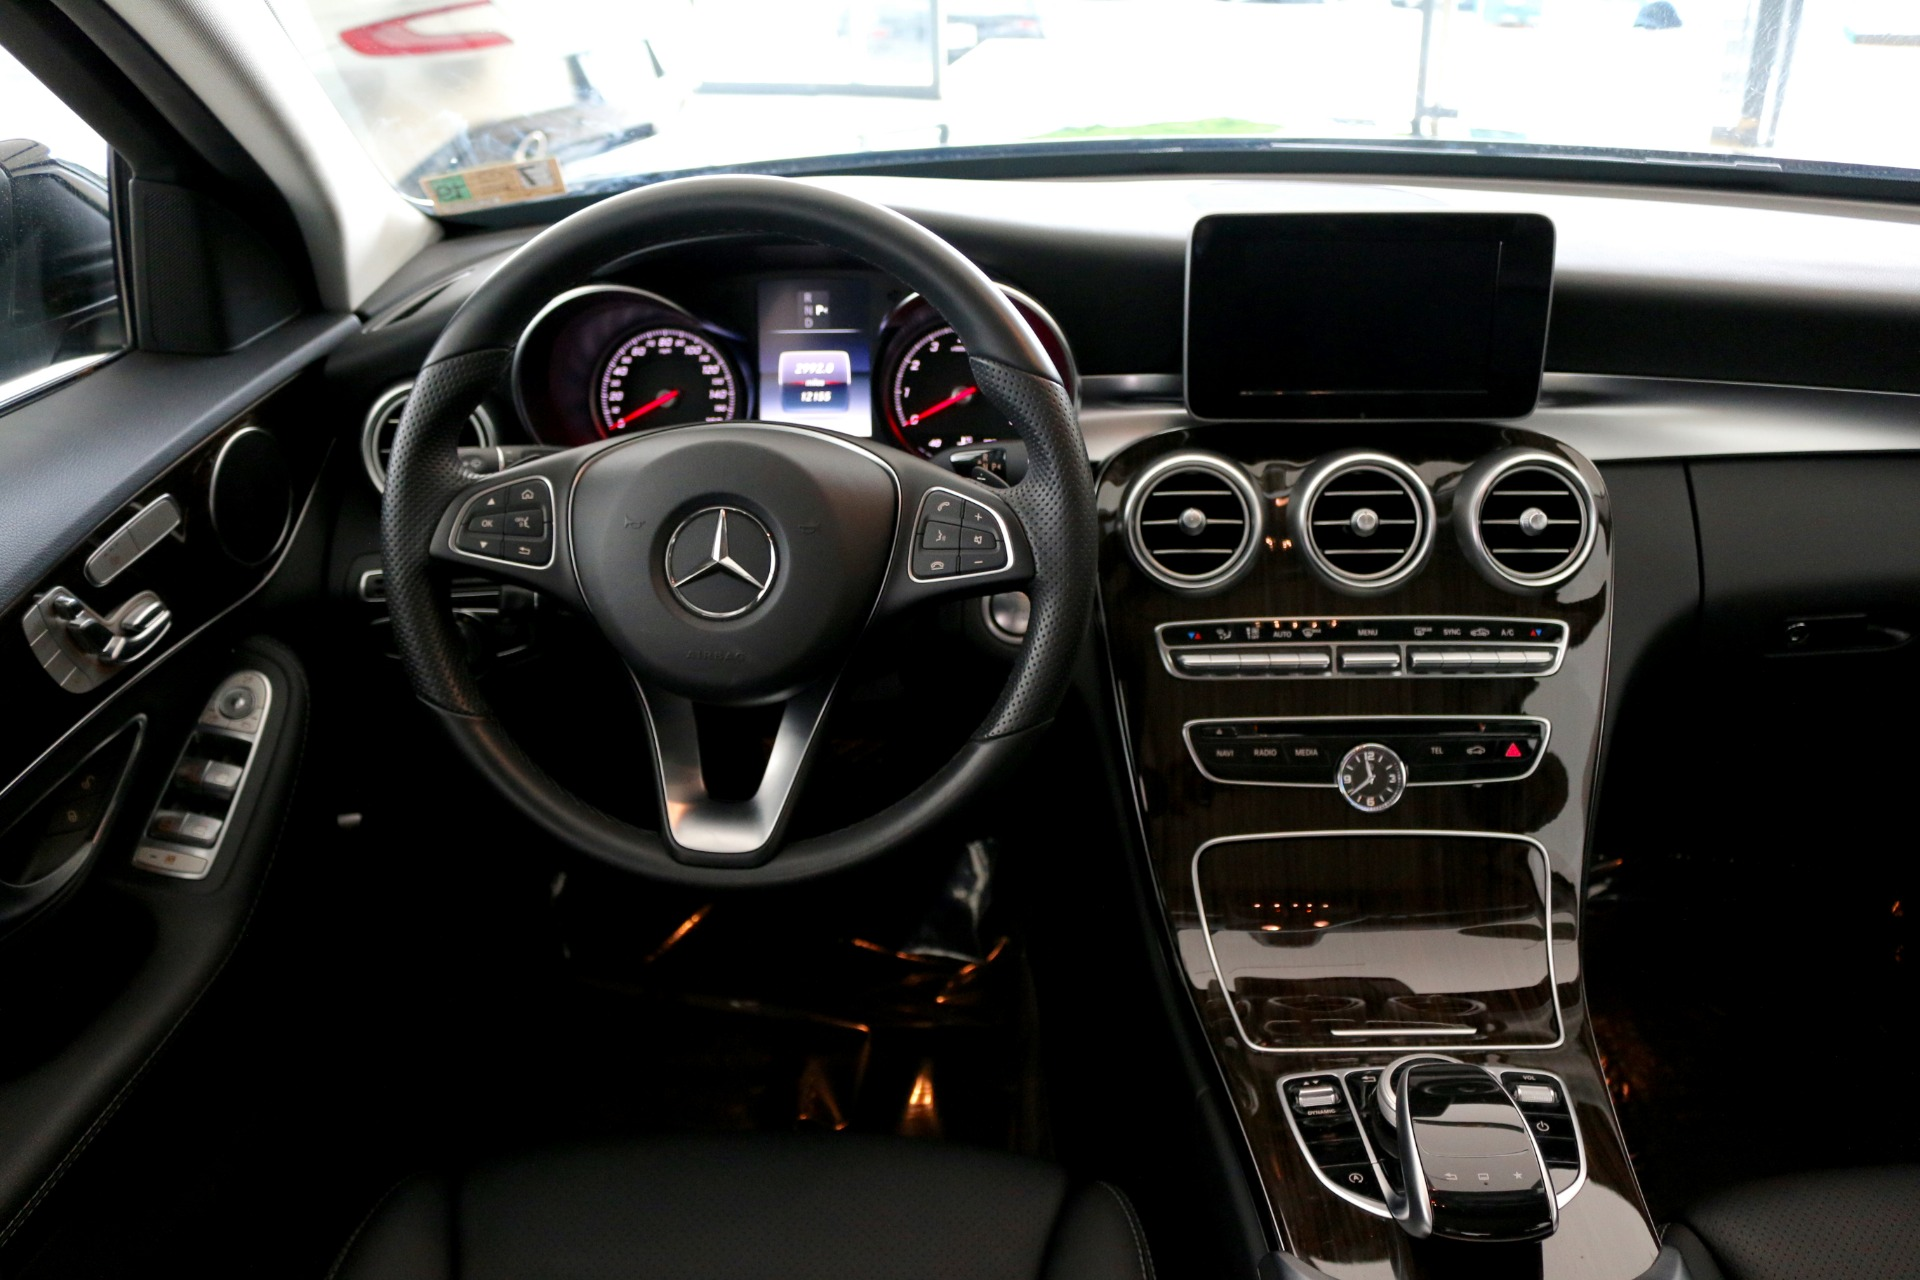 Certified Pre Owned Mercedes >> 2016 Mercedes-Benz C-Class C 300 Sport 4MATIC Stock ...